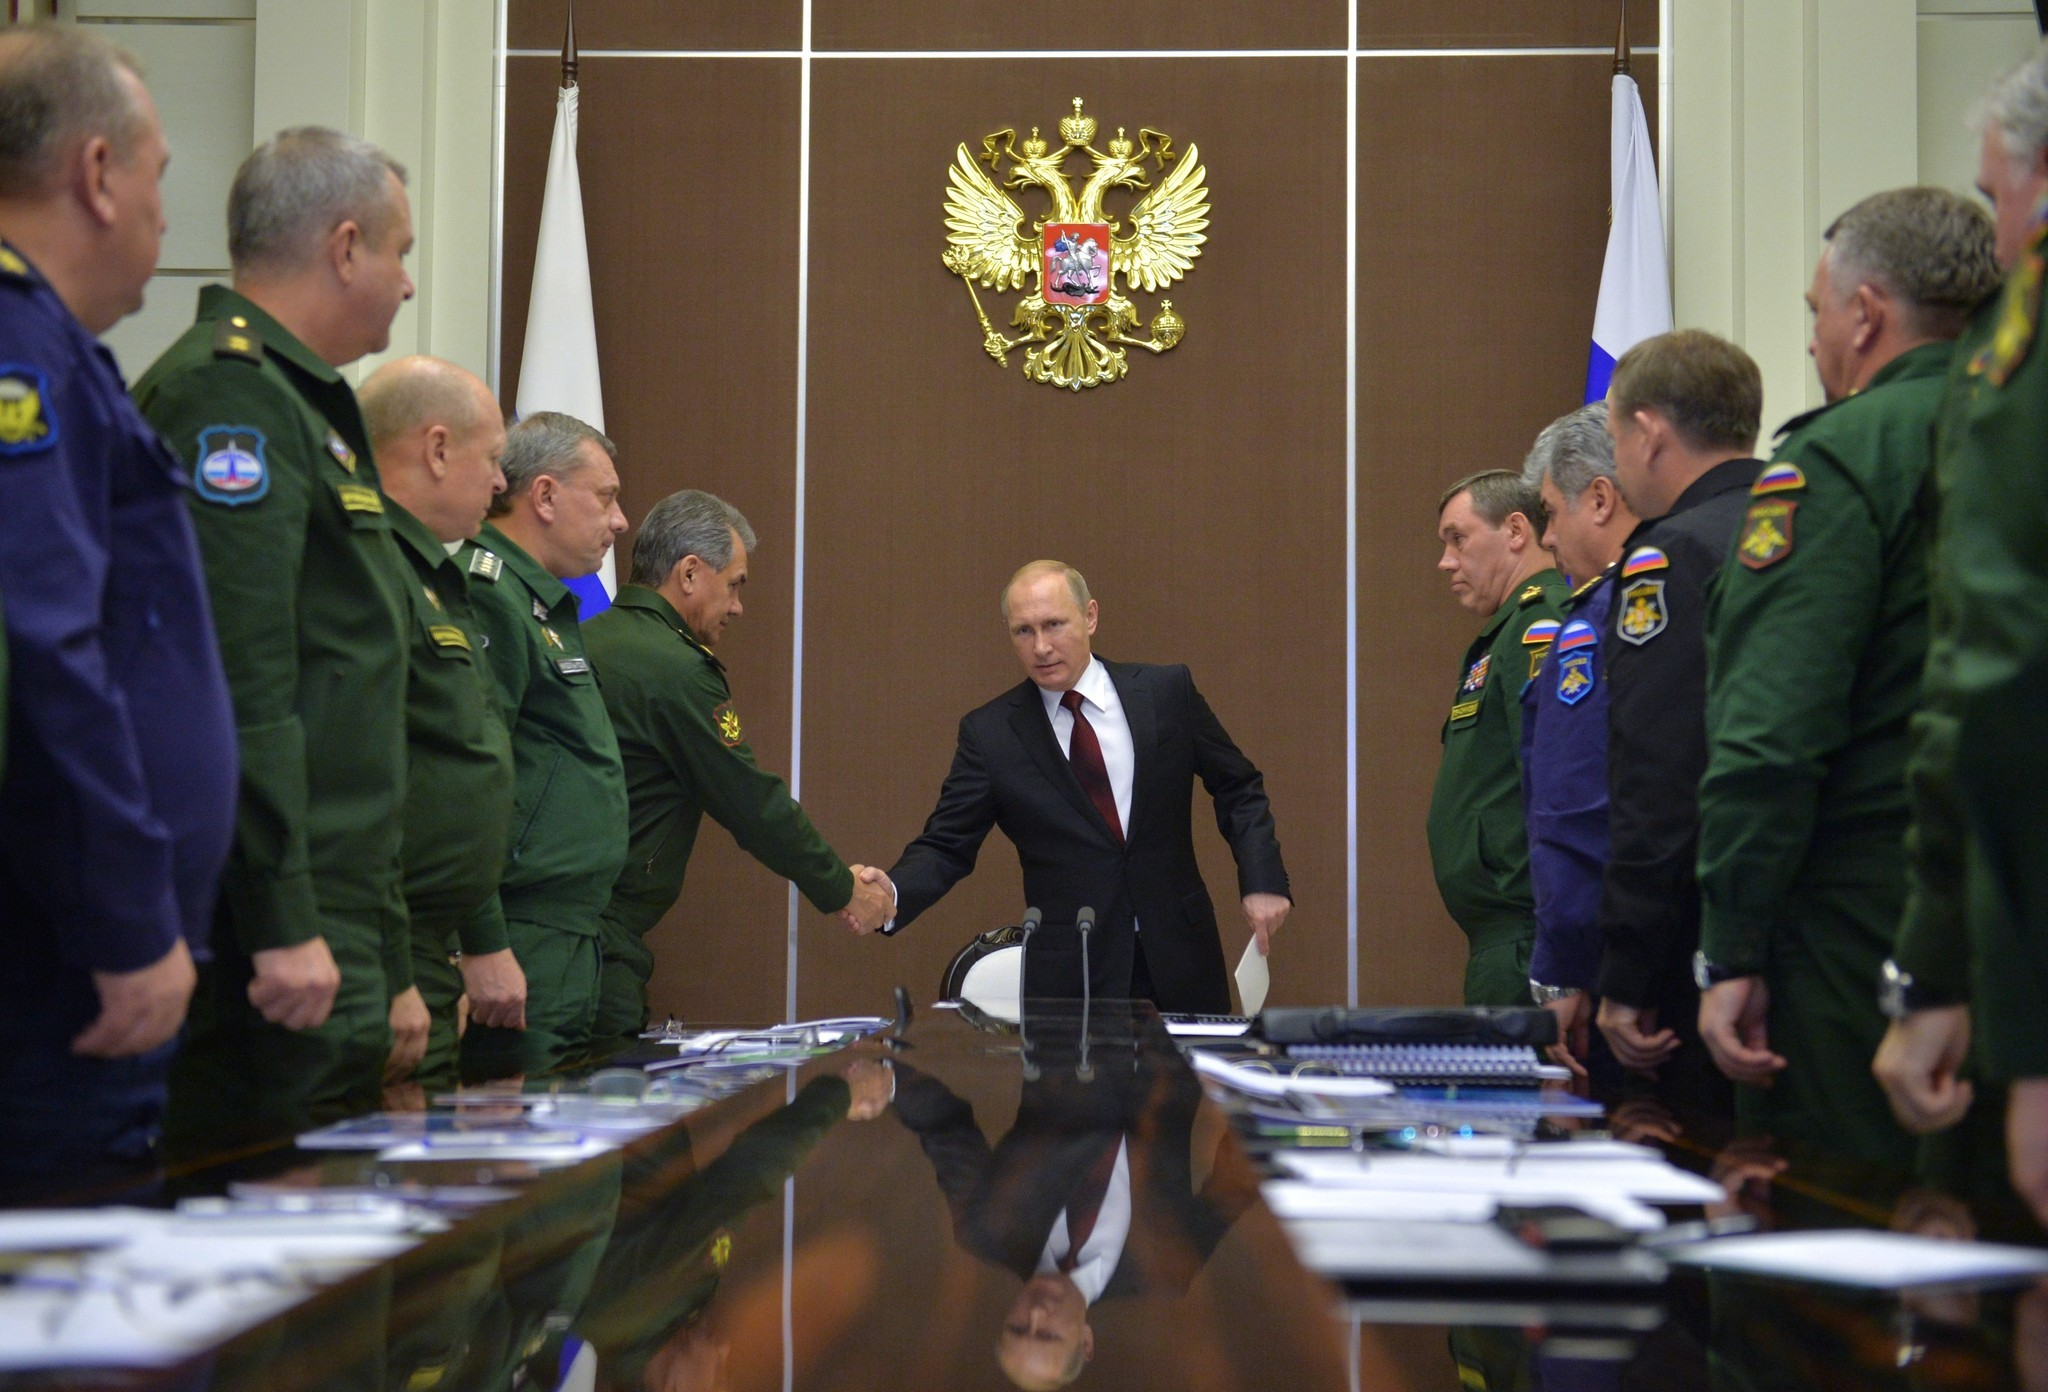 Russia says it loses billions to oil slump, sanctions